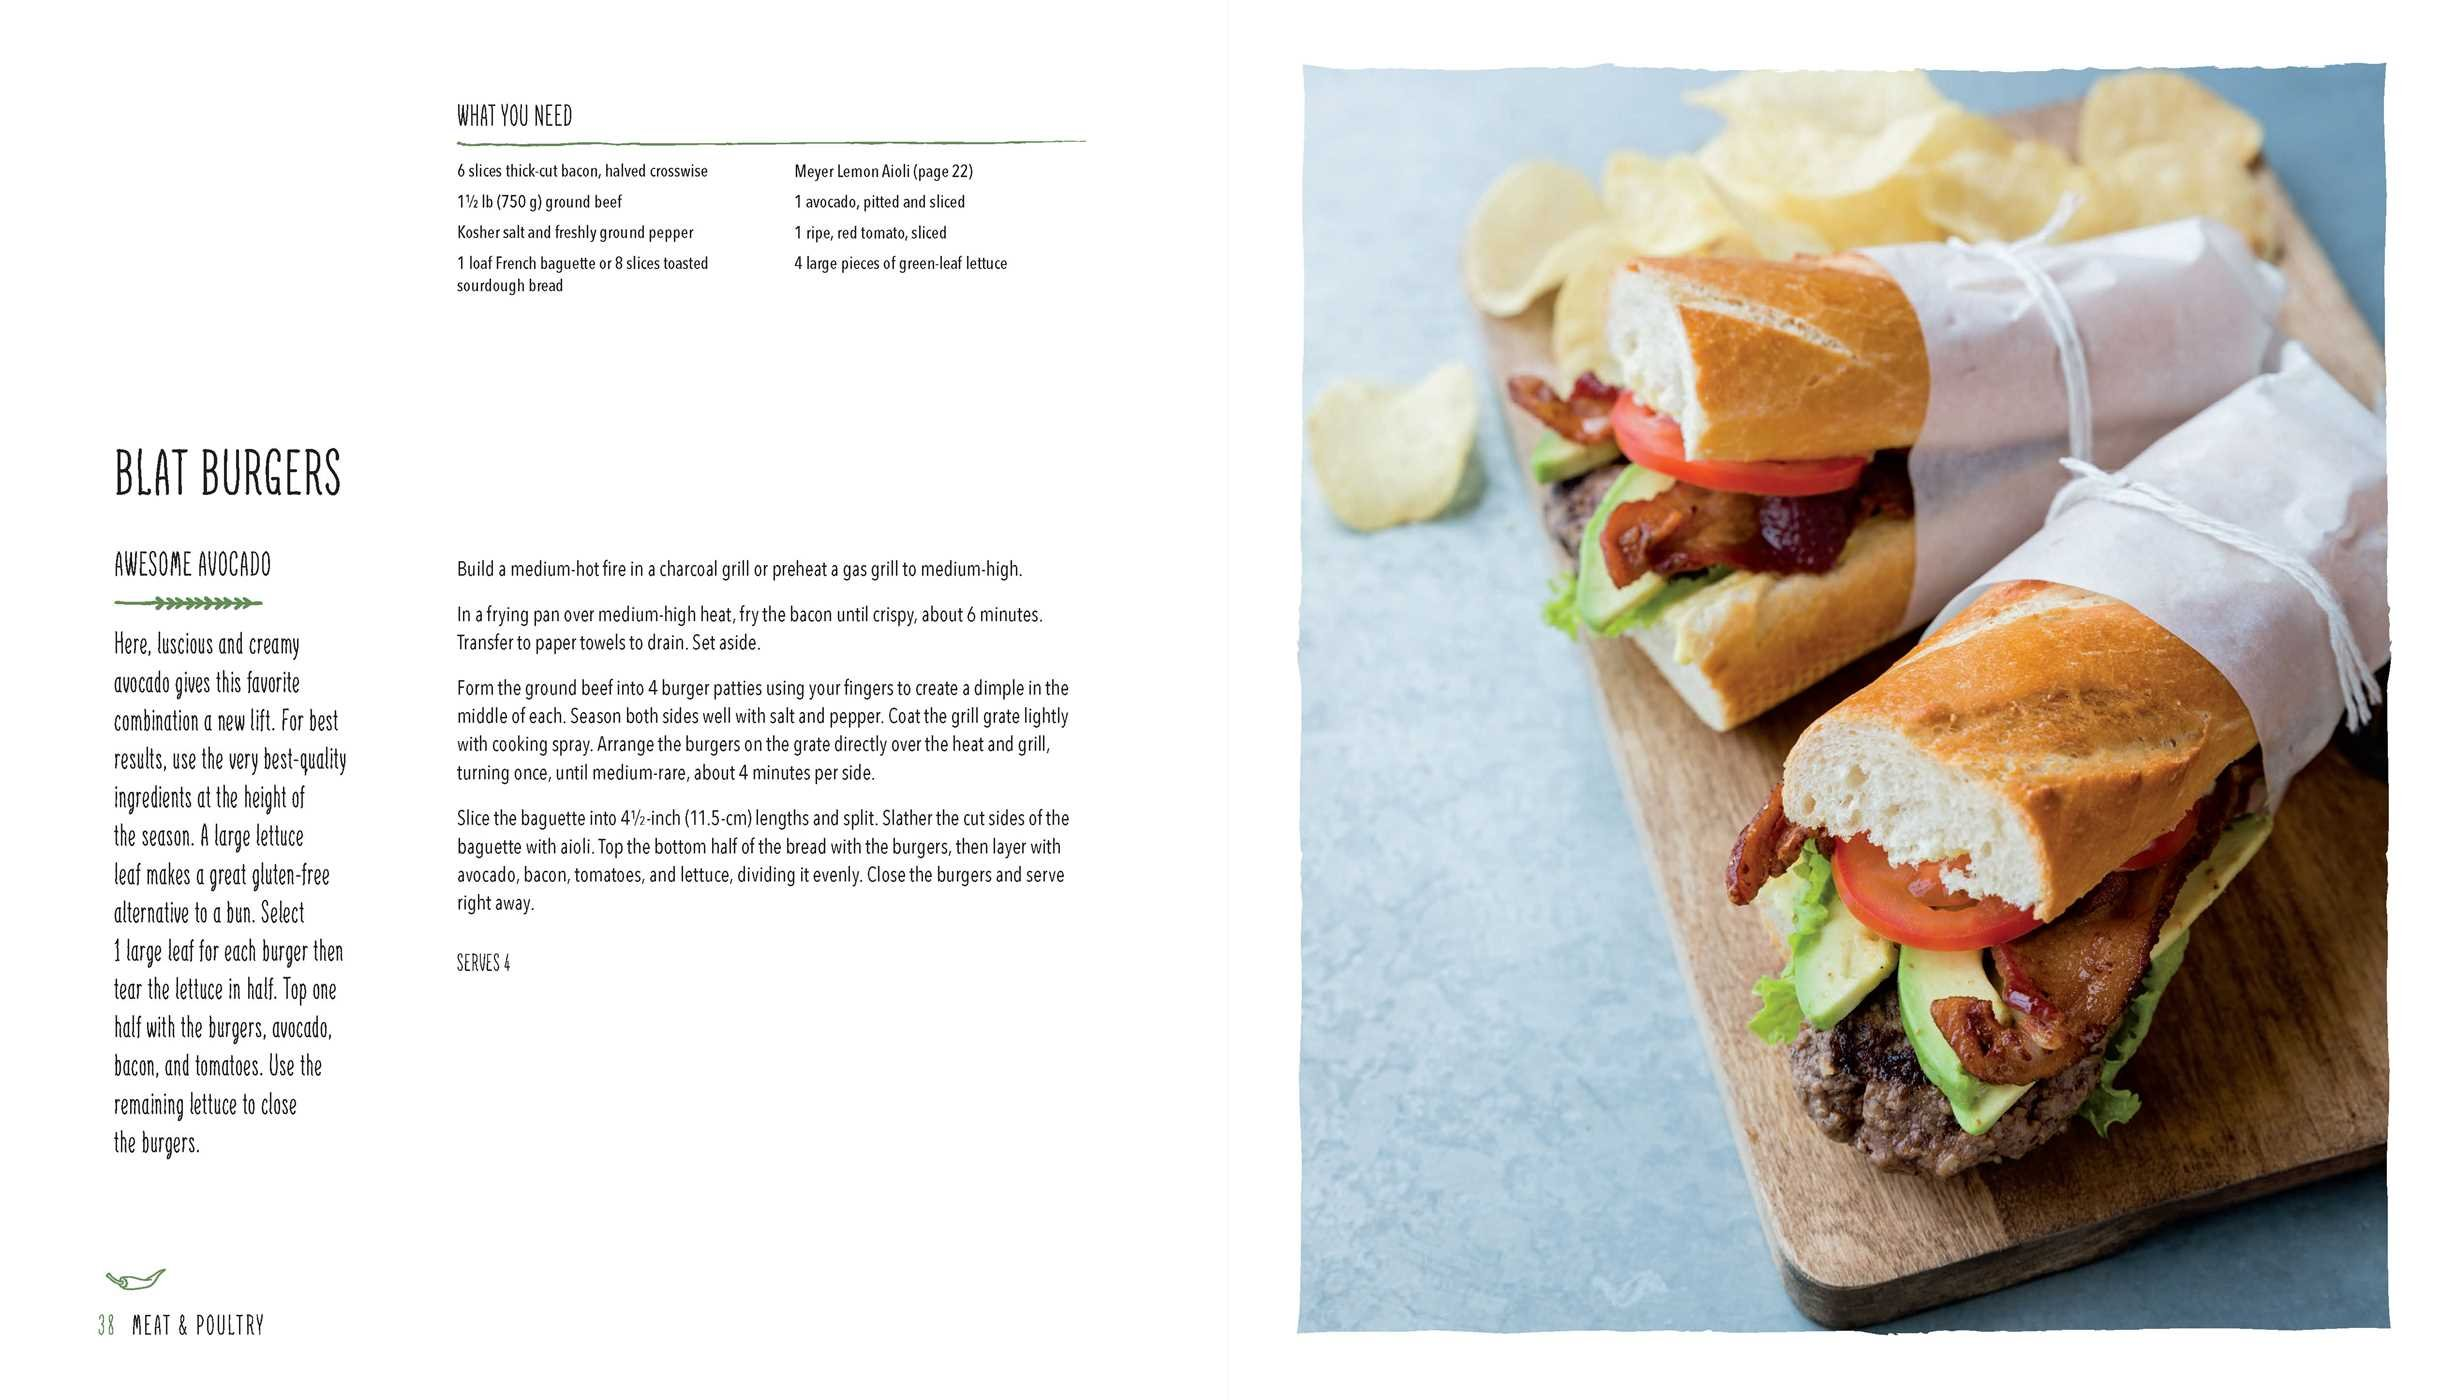 burger night williams sonoma kate mcmillan 9781616287344